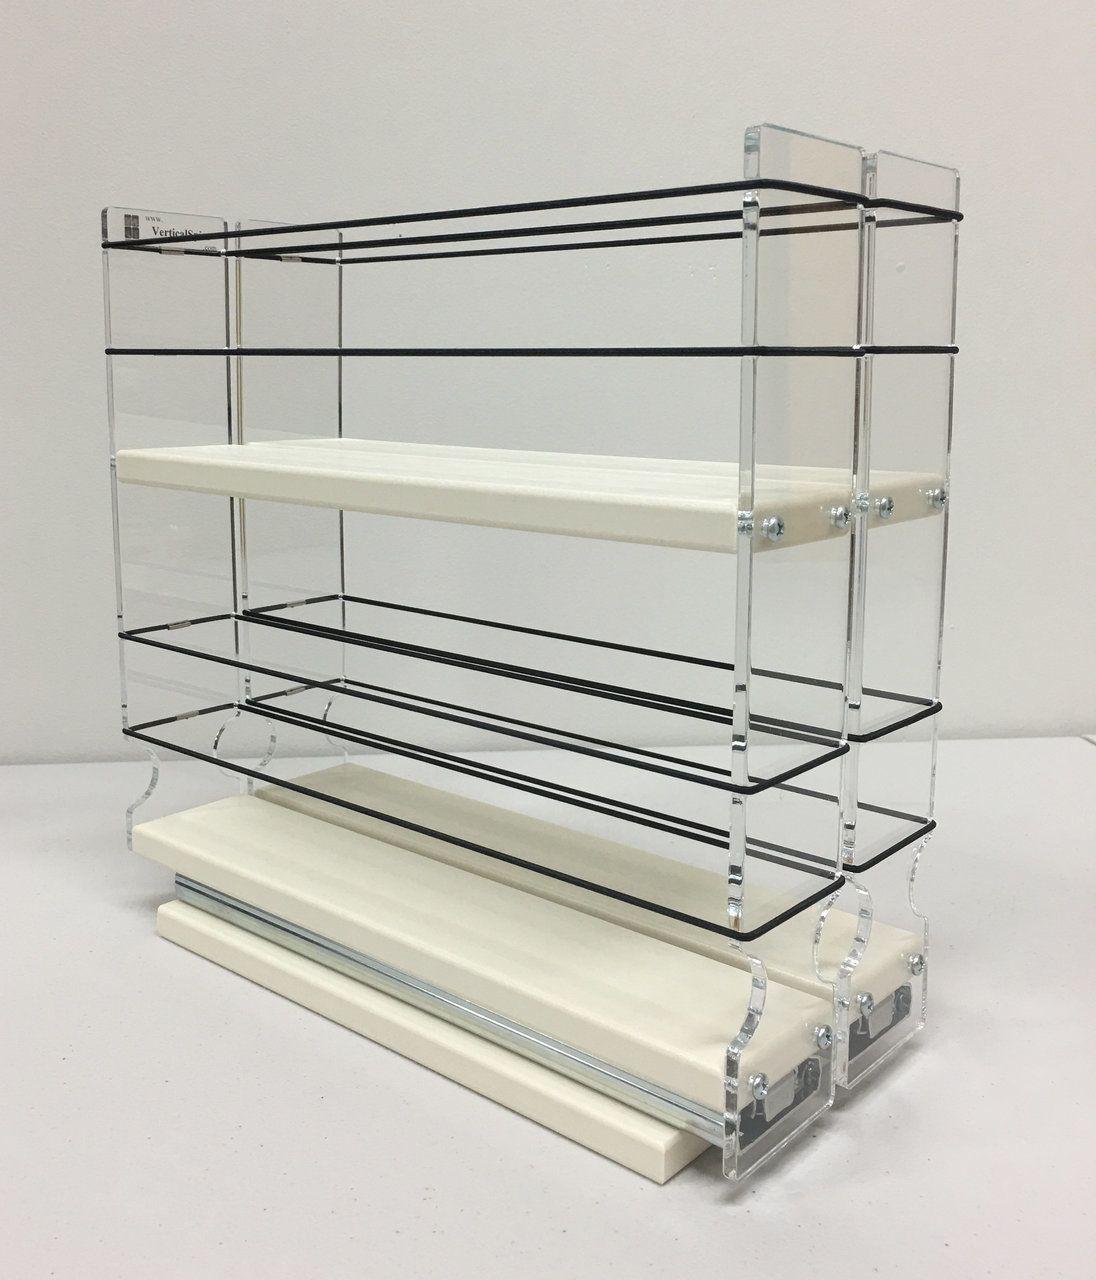 22x2x11 spice rack drawer cream in 2020 spice rack